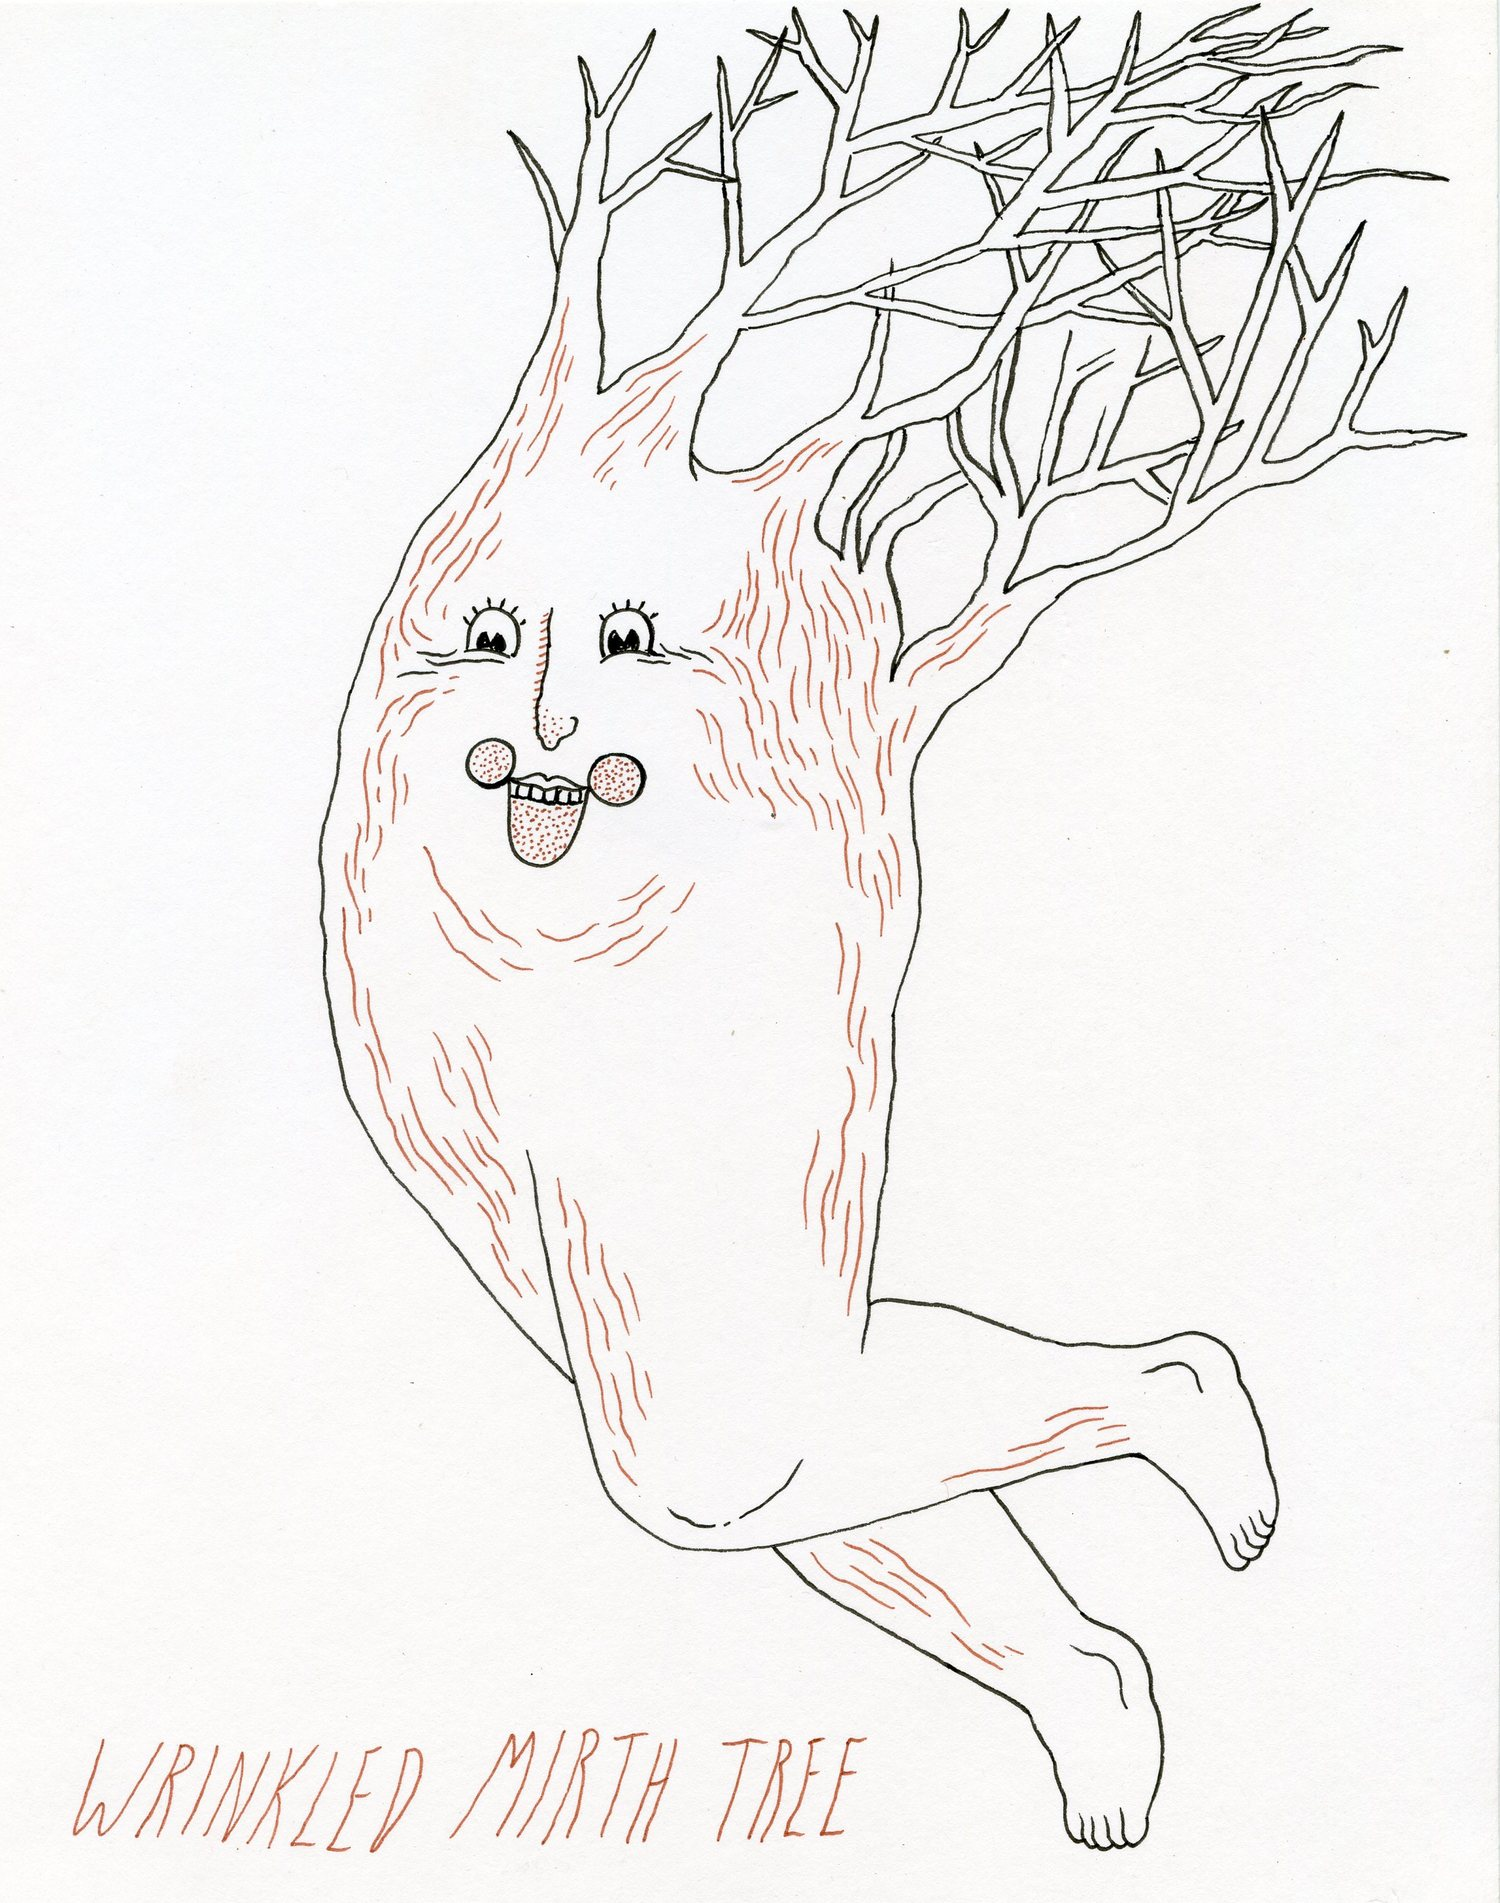 Psychedelic Paper Vomit Series The Art Of Dave Van Patten